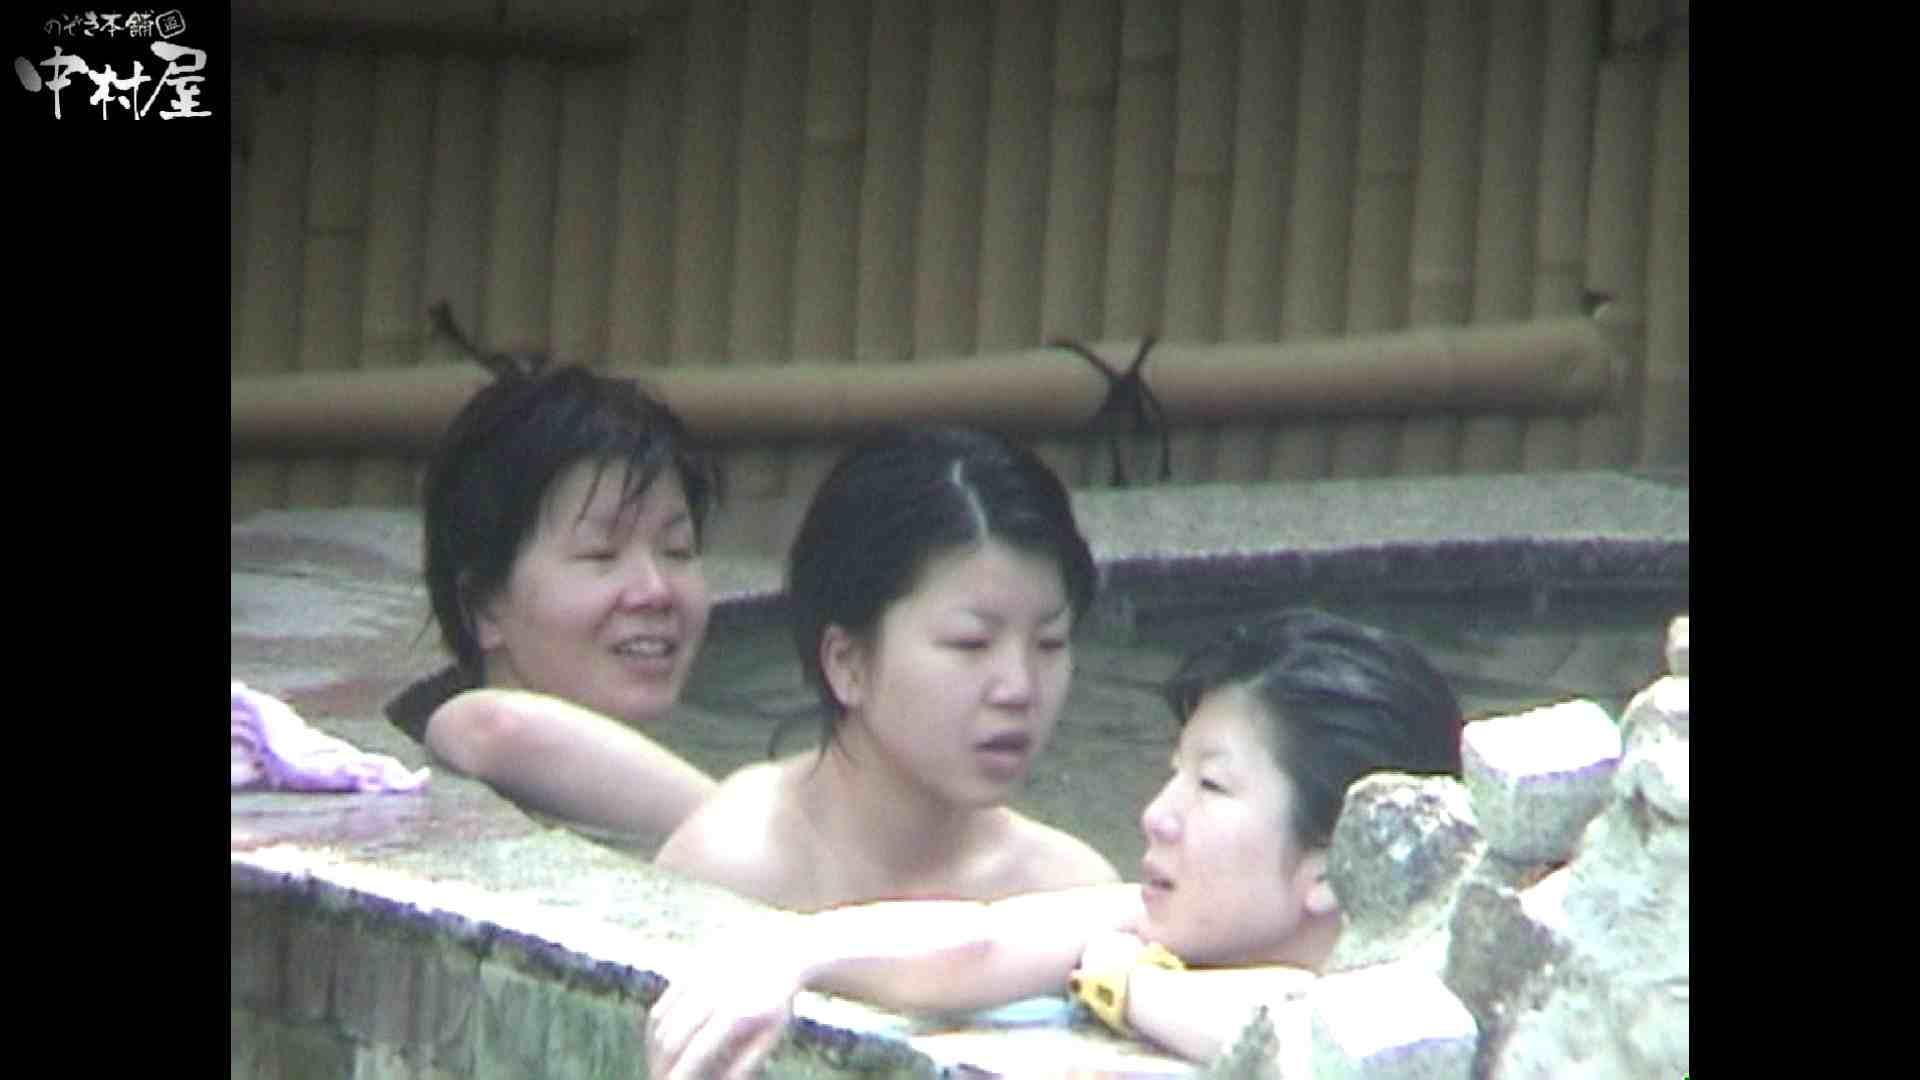 Aquaな露天風呂Vol.936 盗撮映像  110Pix 65